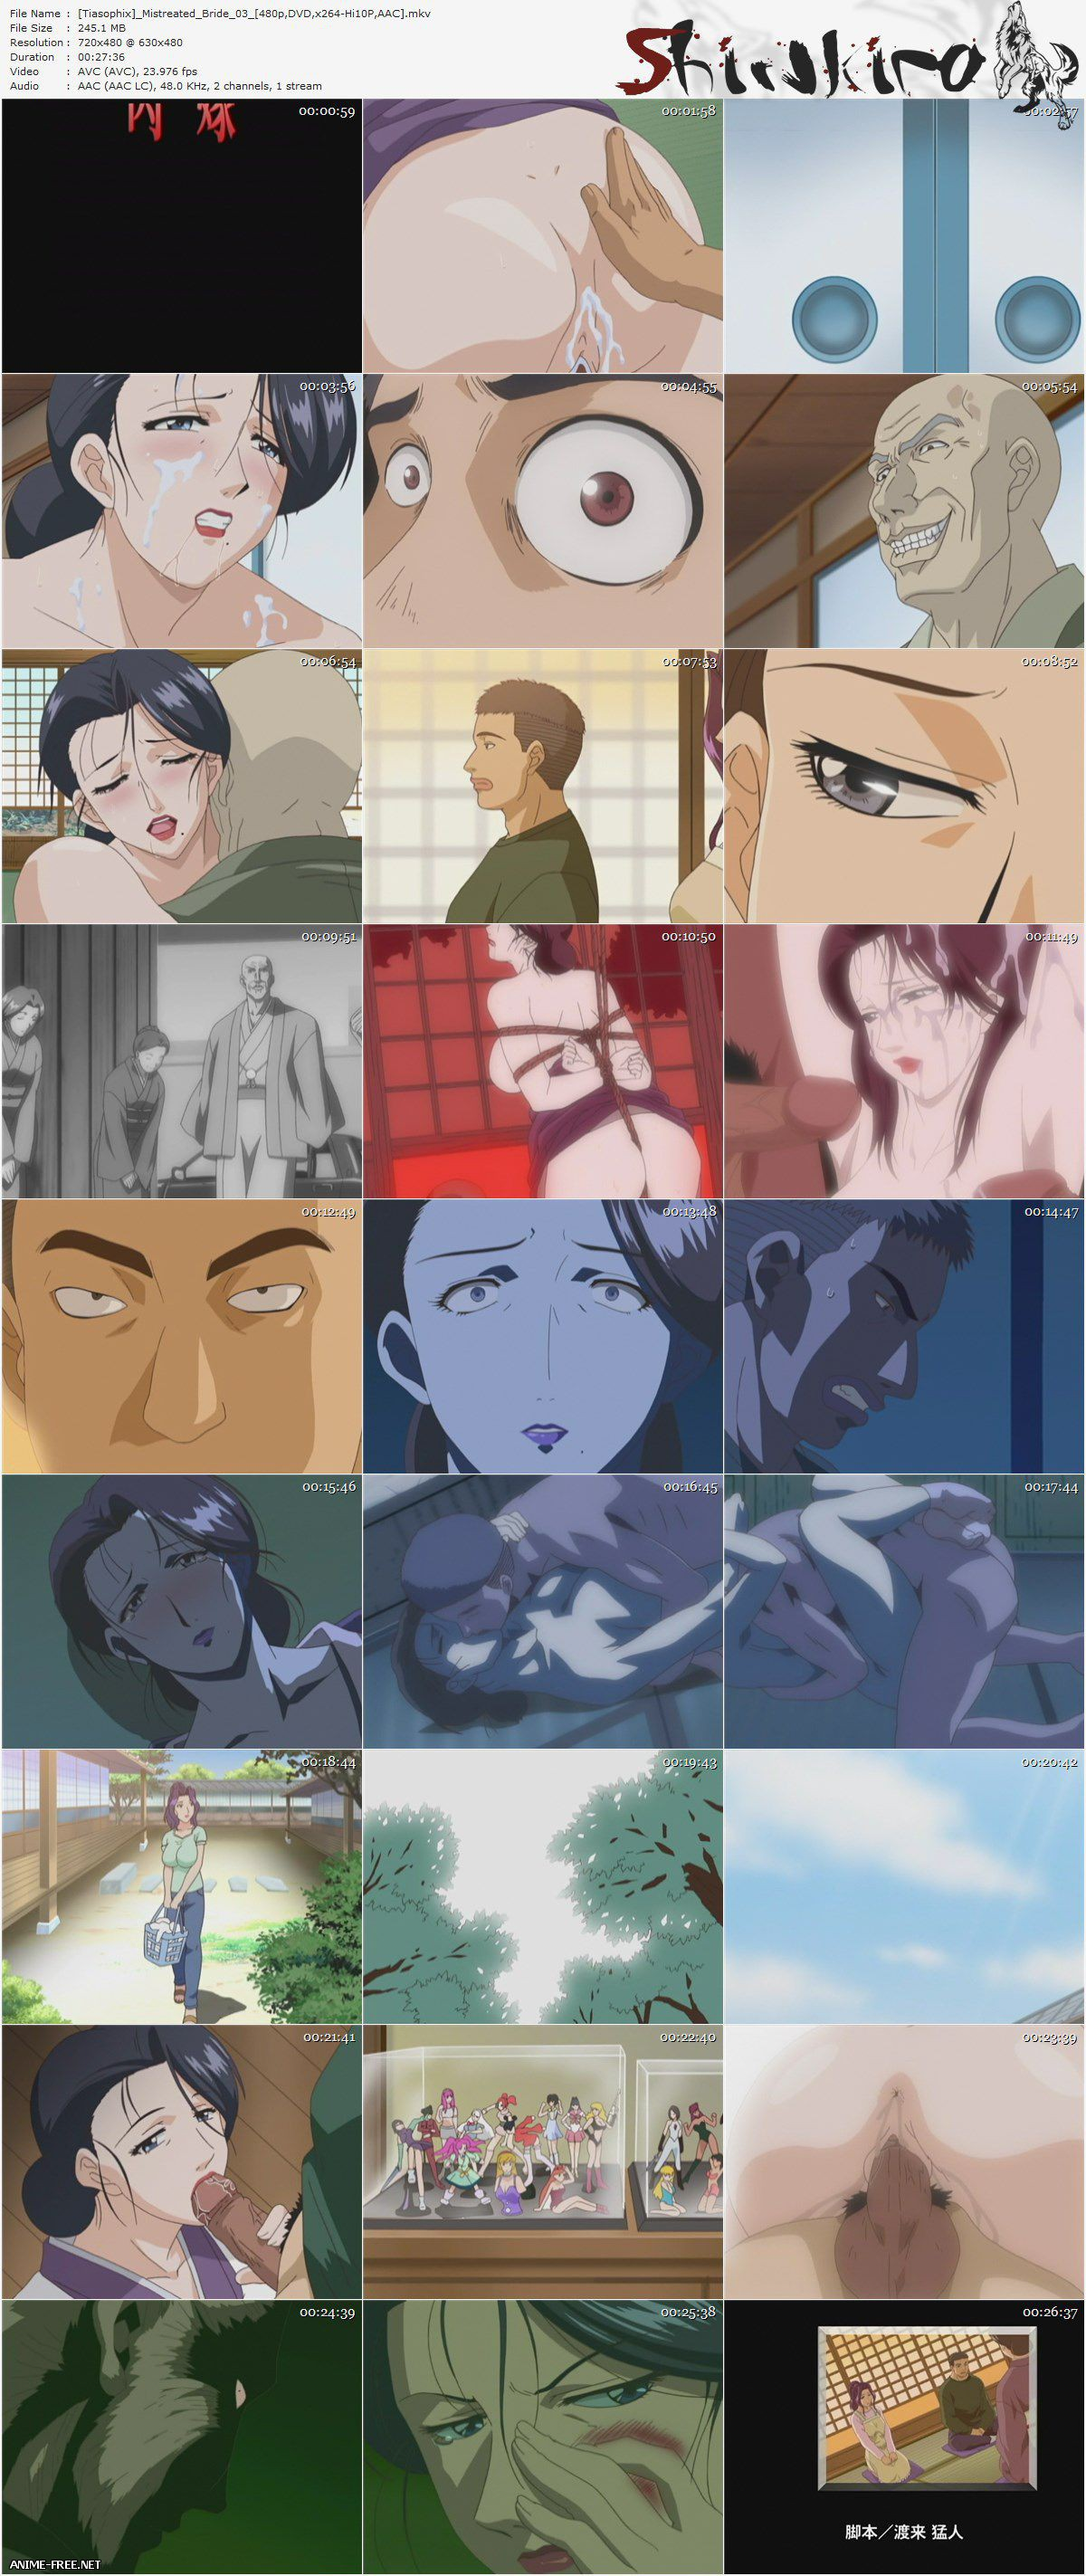 Mistreated Bride / Nikuyome: Takayanagi Ke no Hitobito / Невеста, с которой плохо обращались [4 из 4] [JPN,ENG,RUS] Anime Hentai